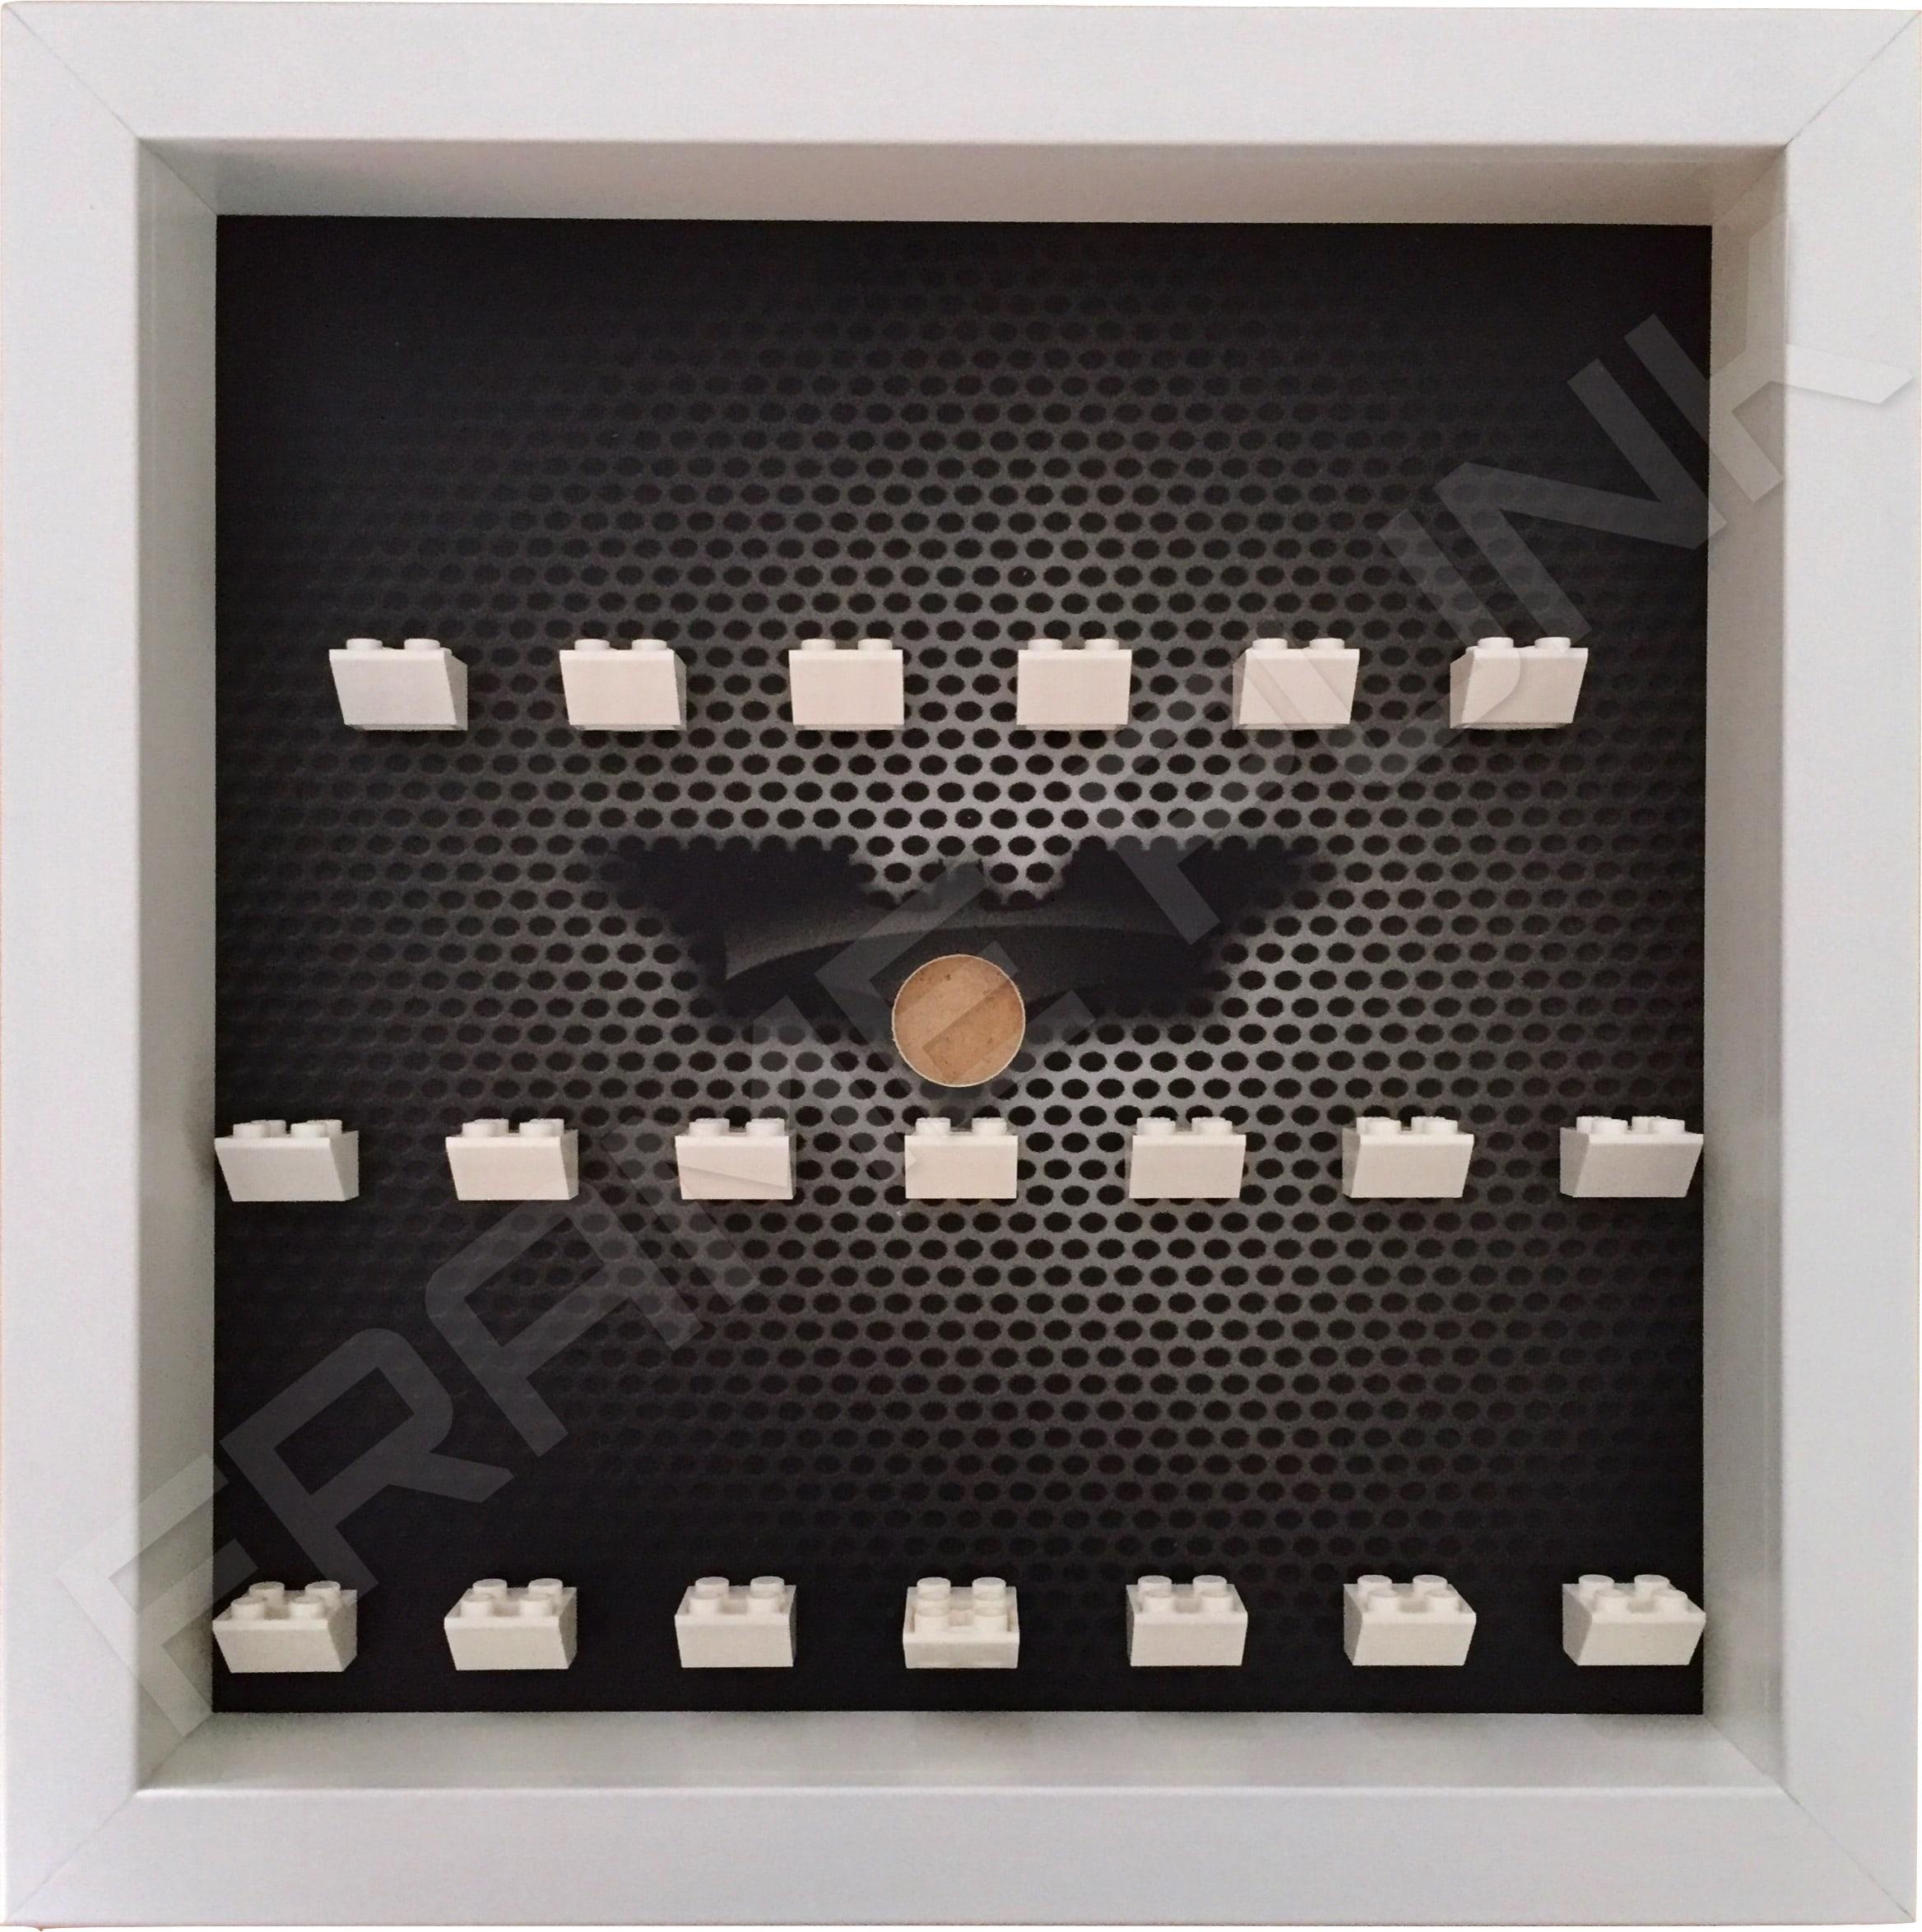 Contemporary LEGO Batman Movie Minifigures Series display frame (white)